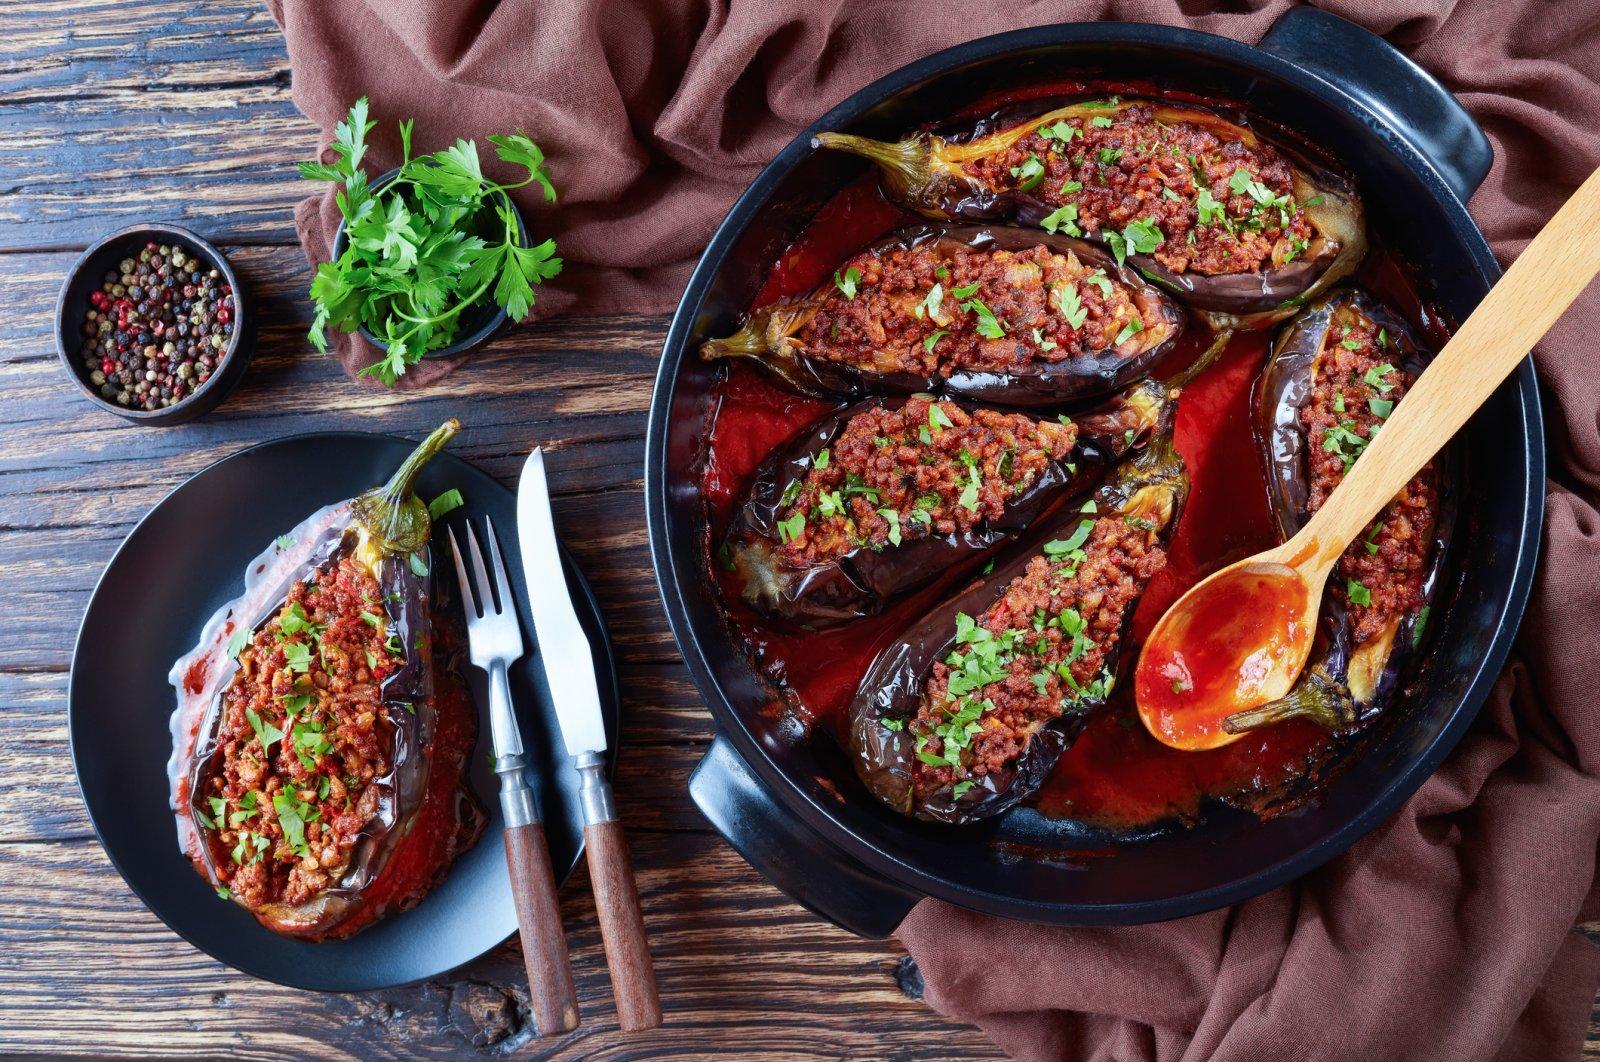 Karnıyarık is a classic Turkish dish and a must for the menu of any Turkish restaurant. (iStock Photo)